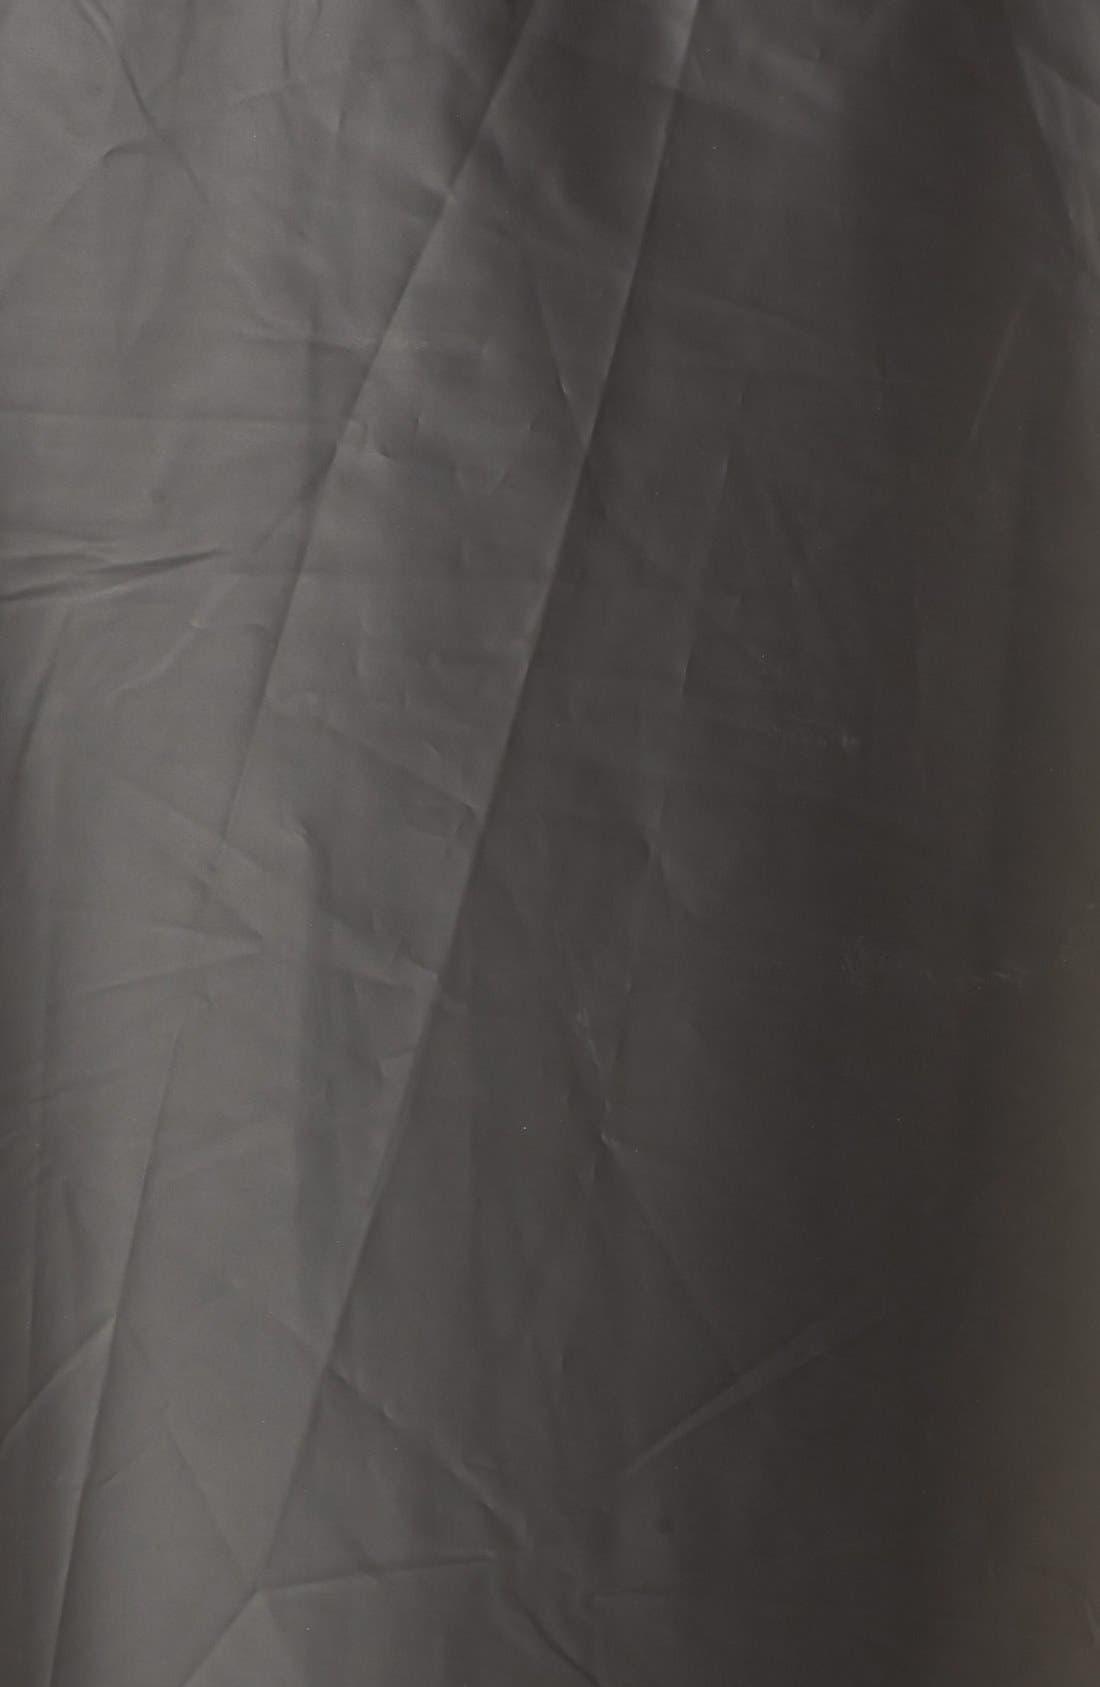 'Original' Waterproof Clear Poncho,                             Alternate thumbnail 5, color,                             022